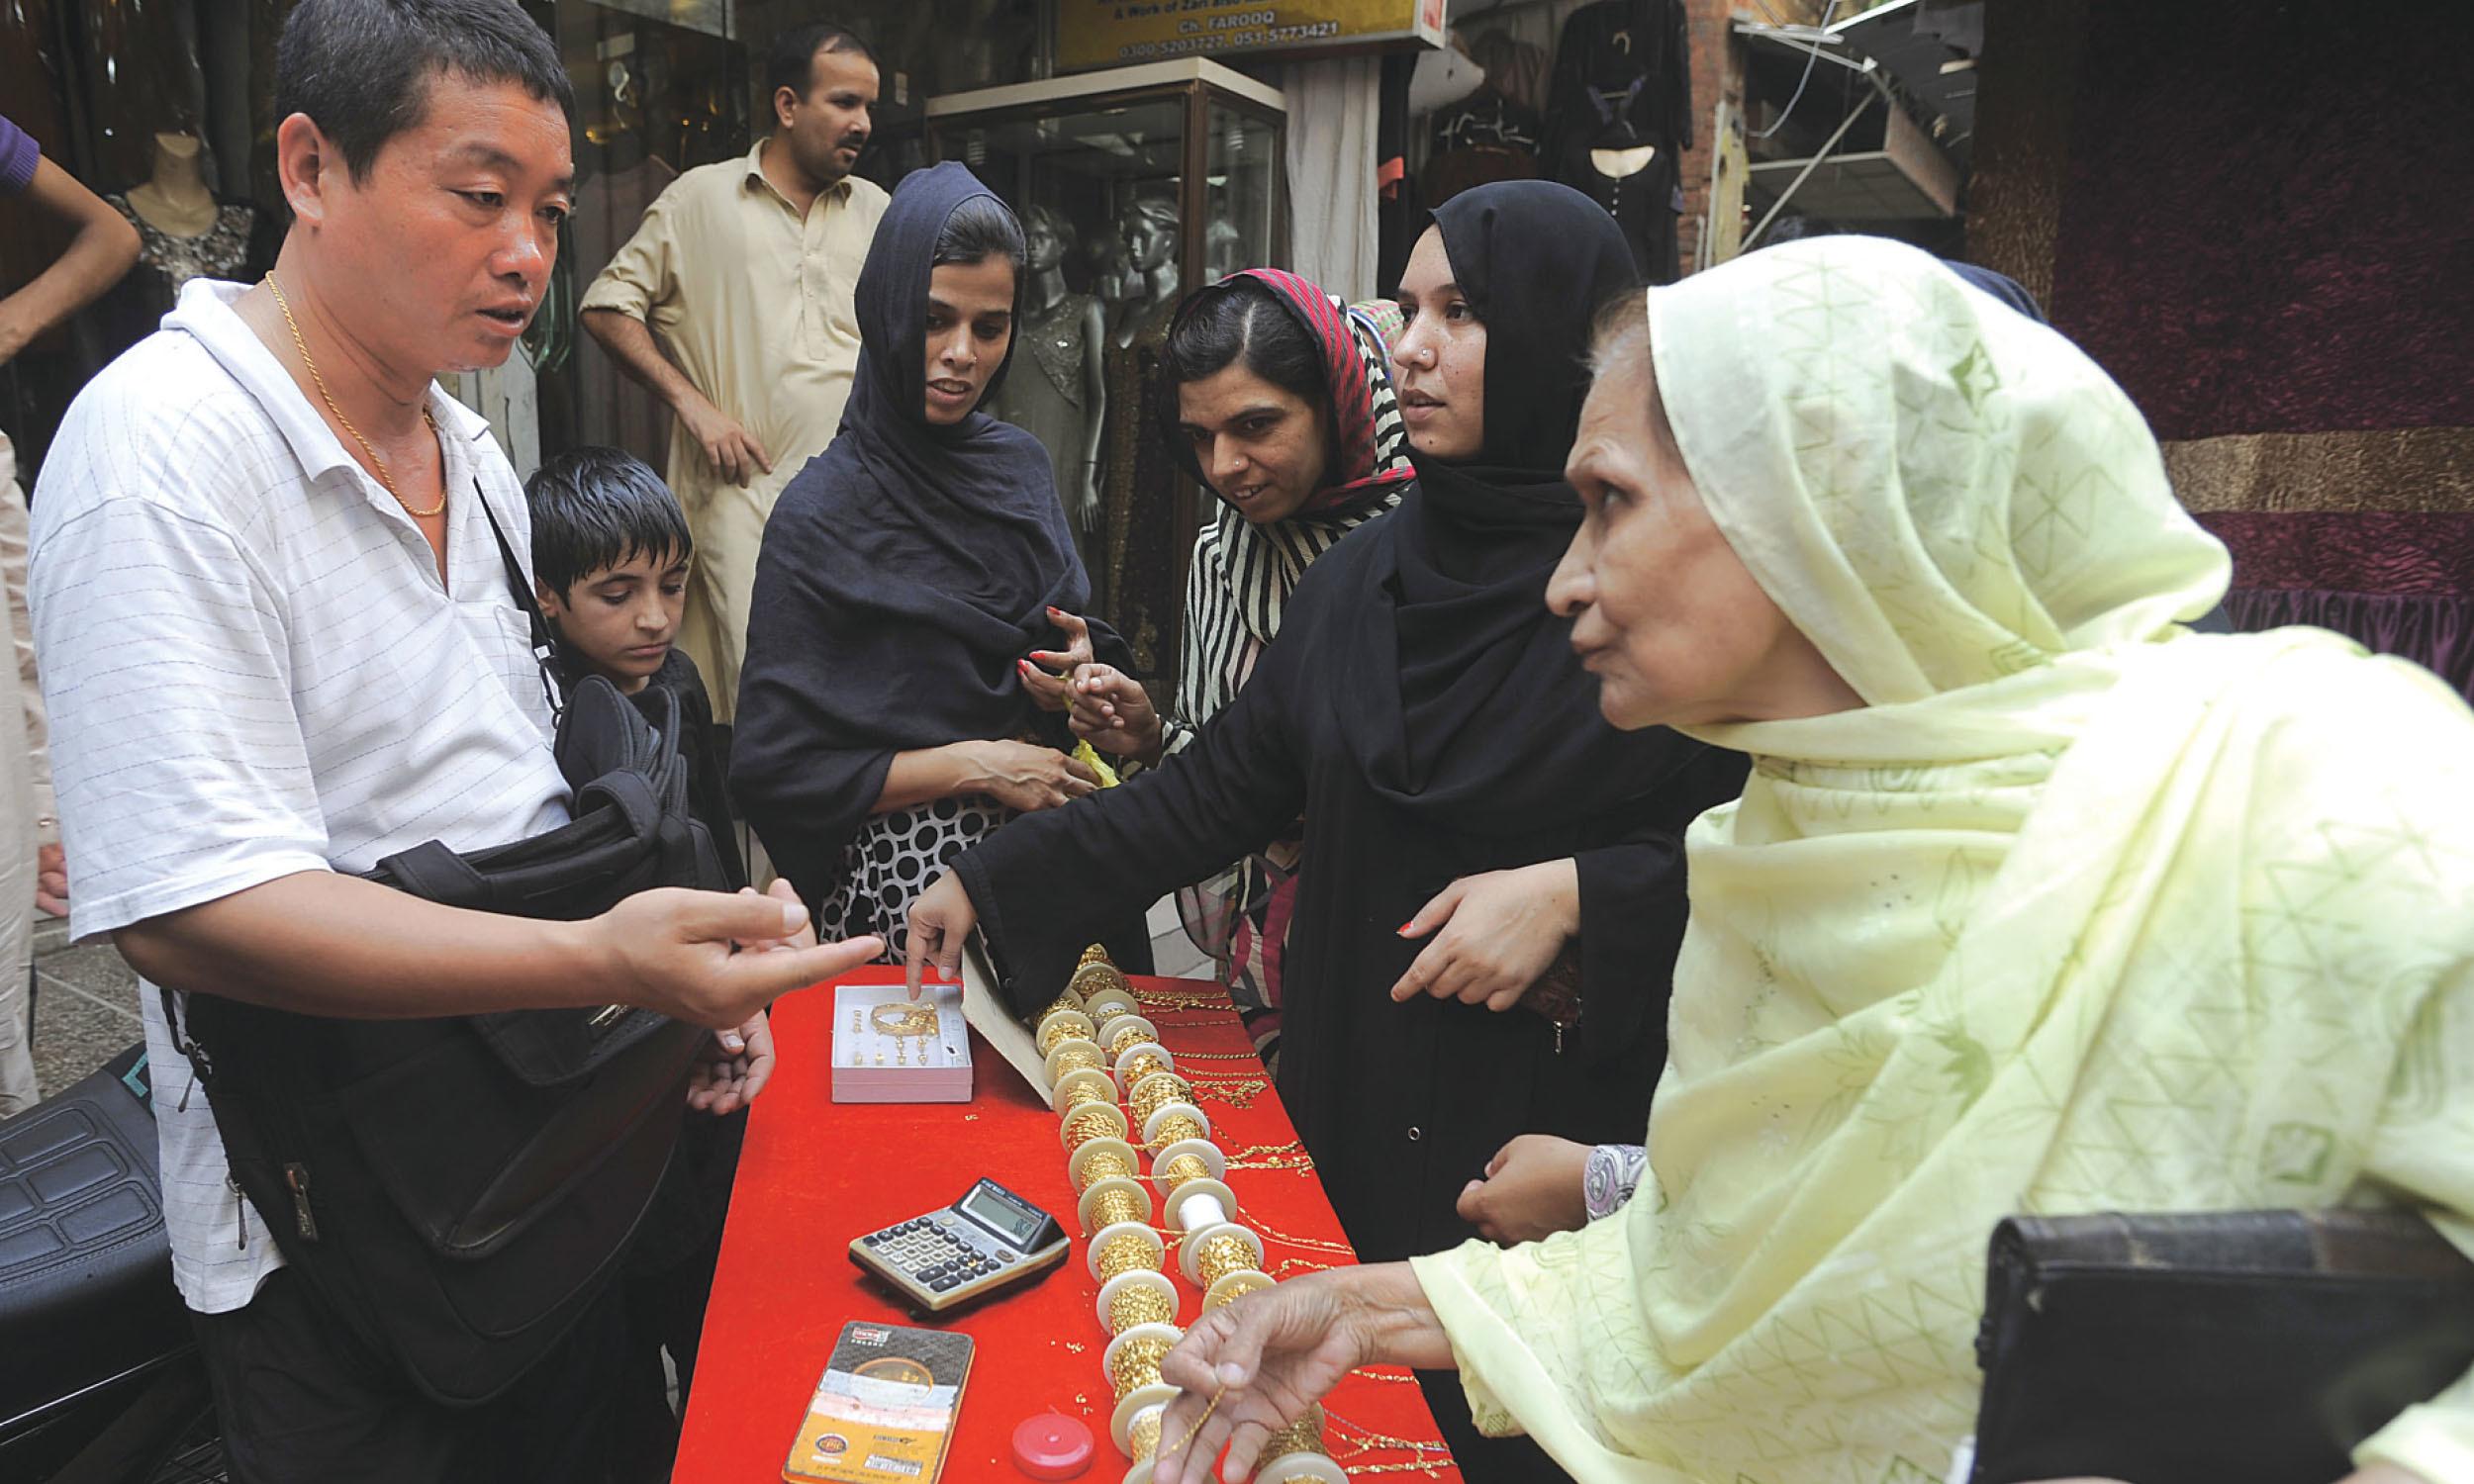 Women buy jewellery from a Chinese vendor in Rawalpindi's Raja Bazaar | Tanveer Shehzad, White Star